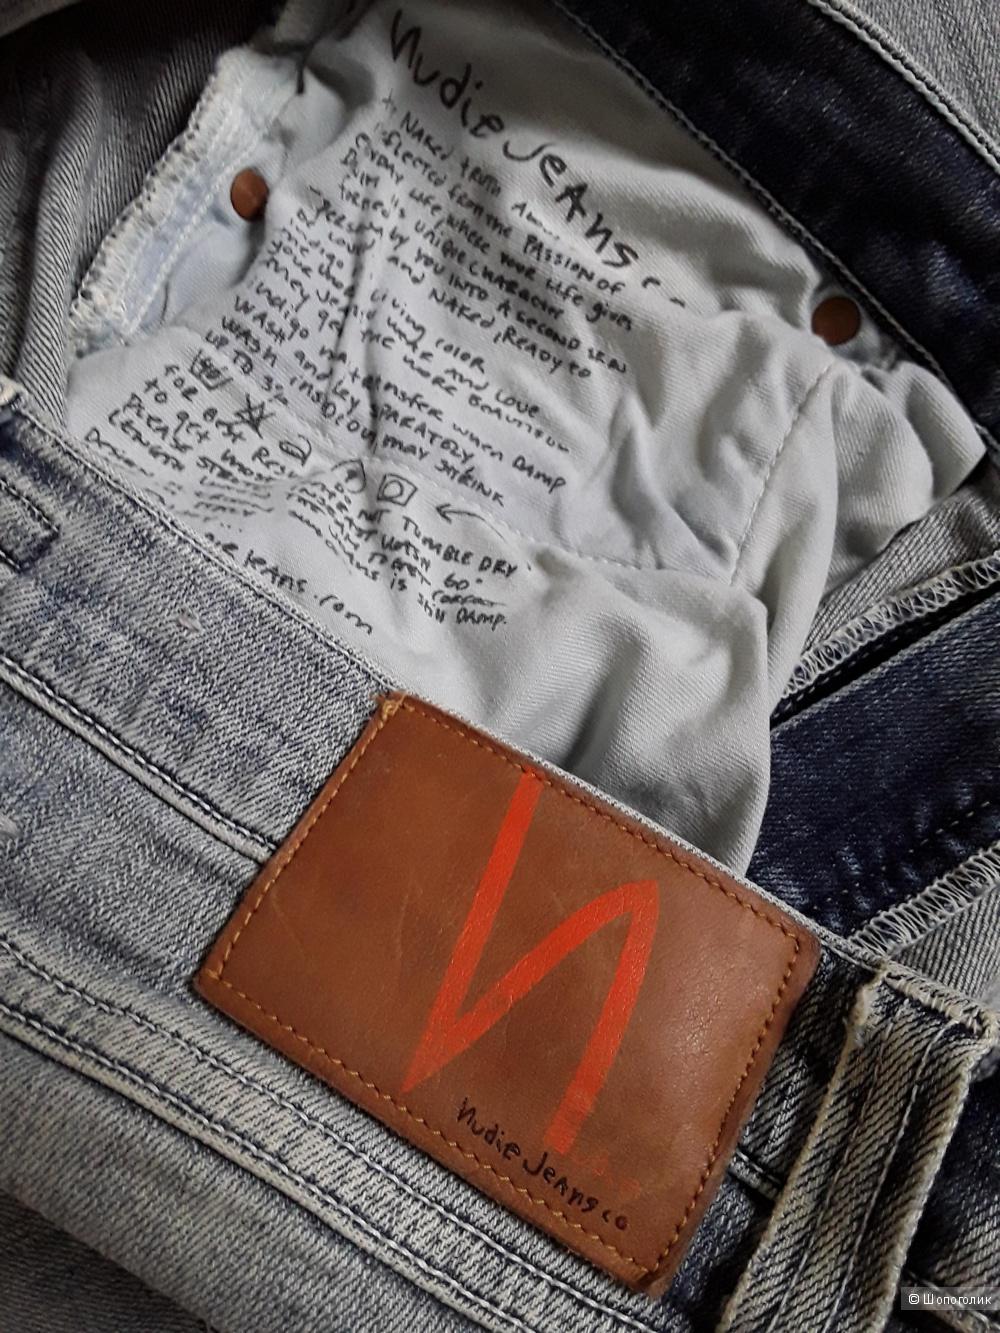 Джинсы Nudie jeans co размер 31/34